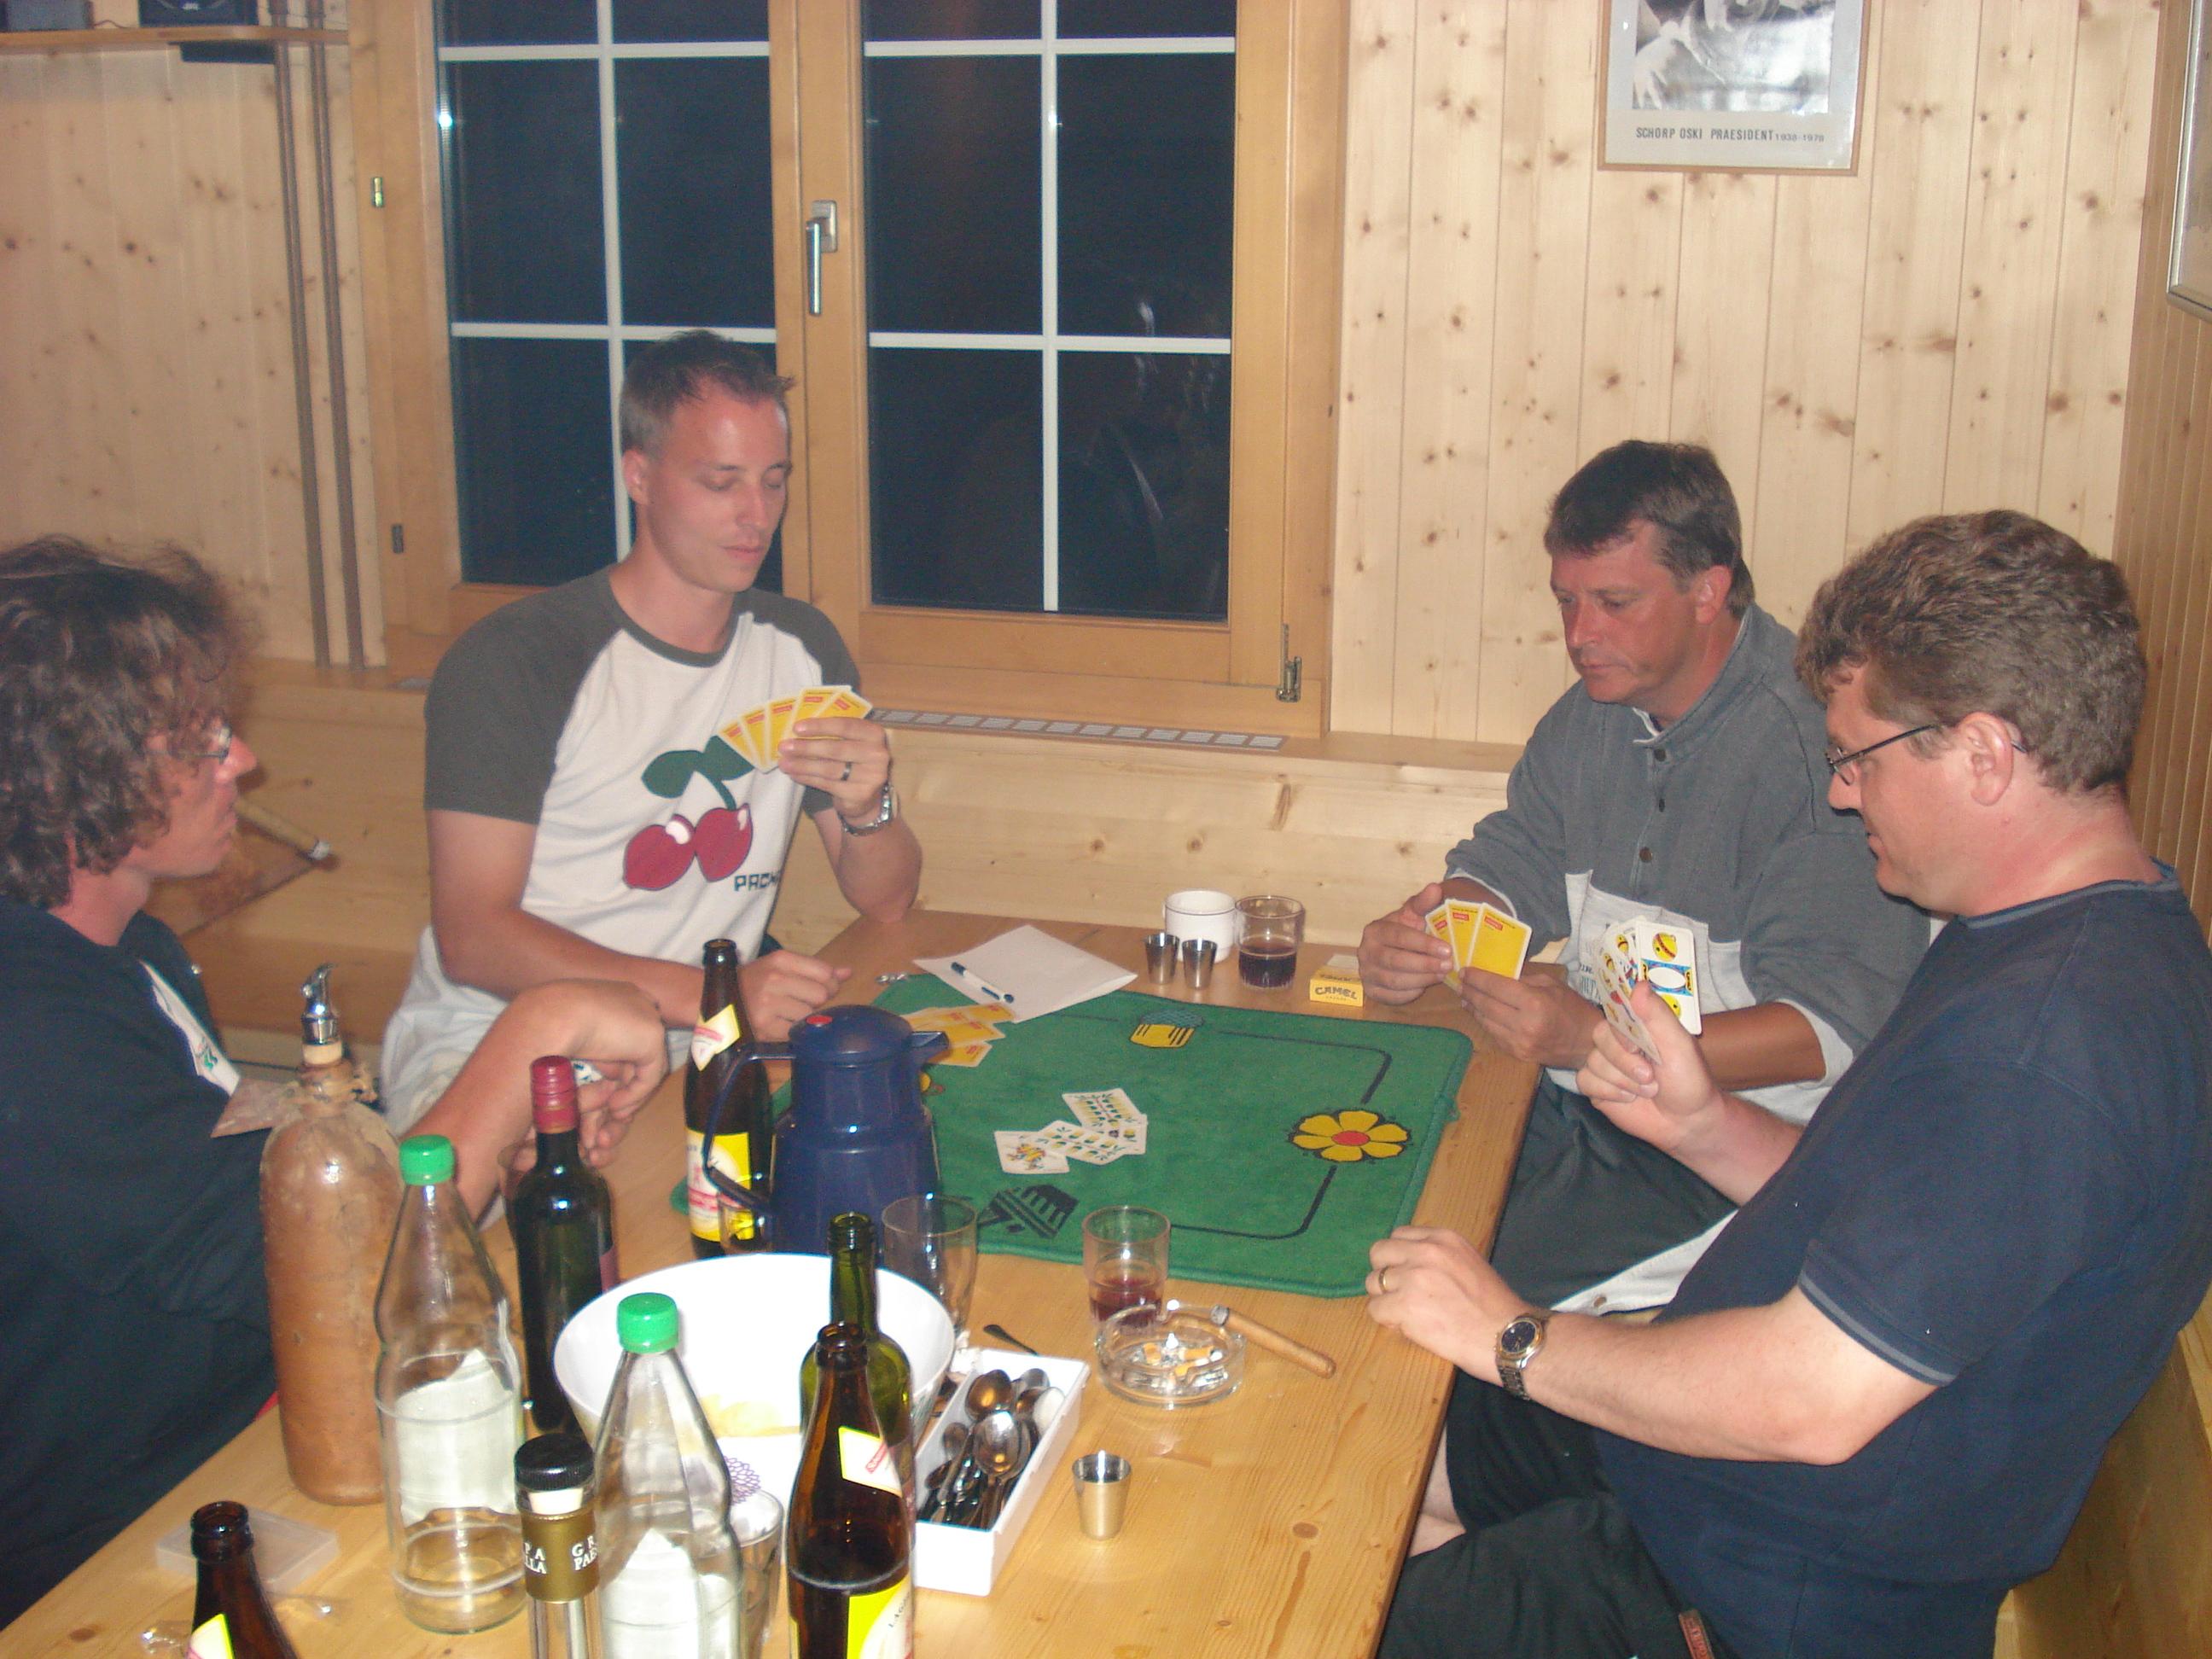 24/07/09: Turnier, Flums